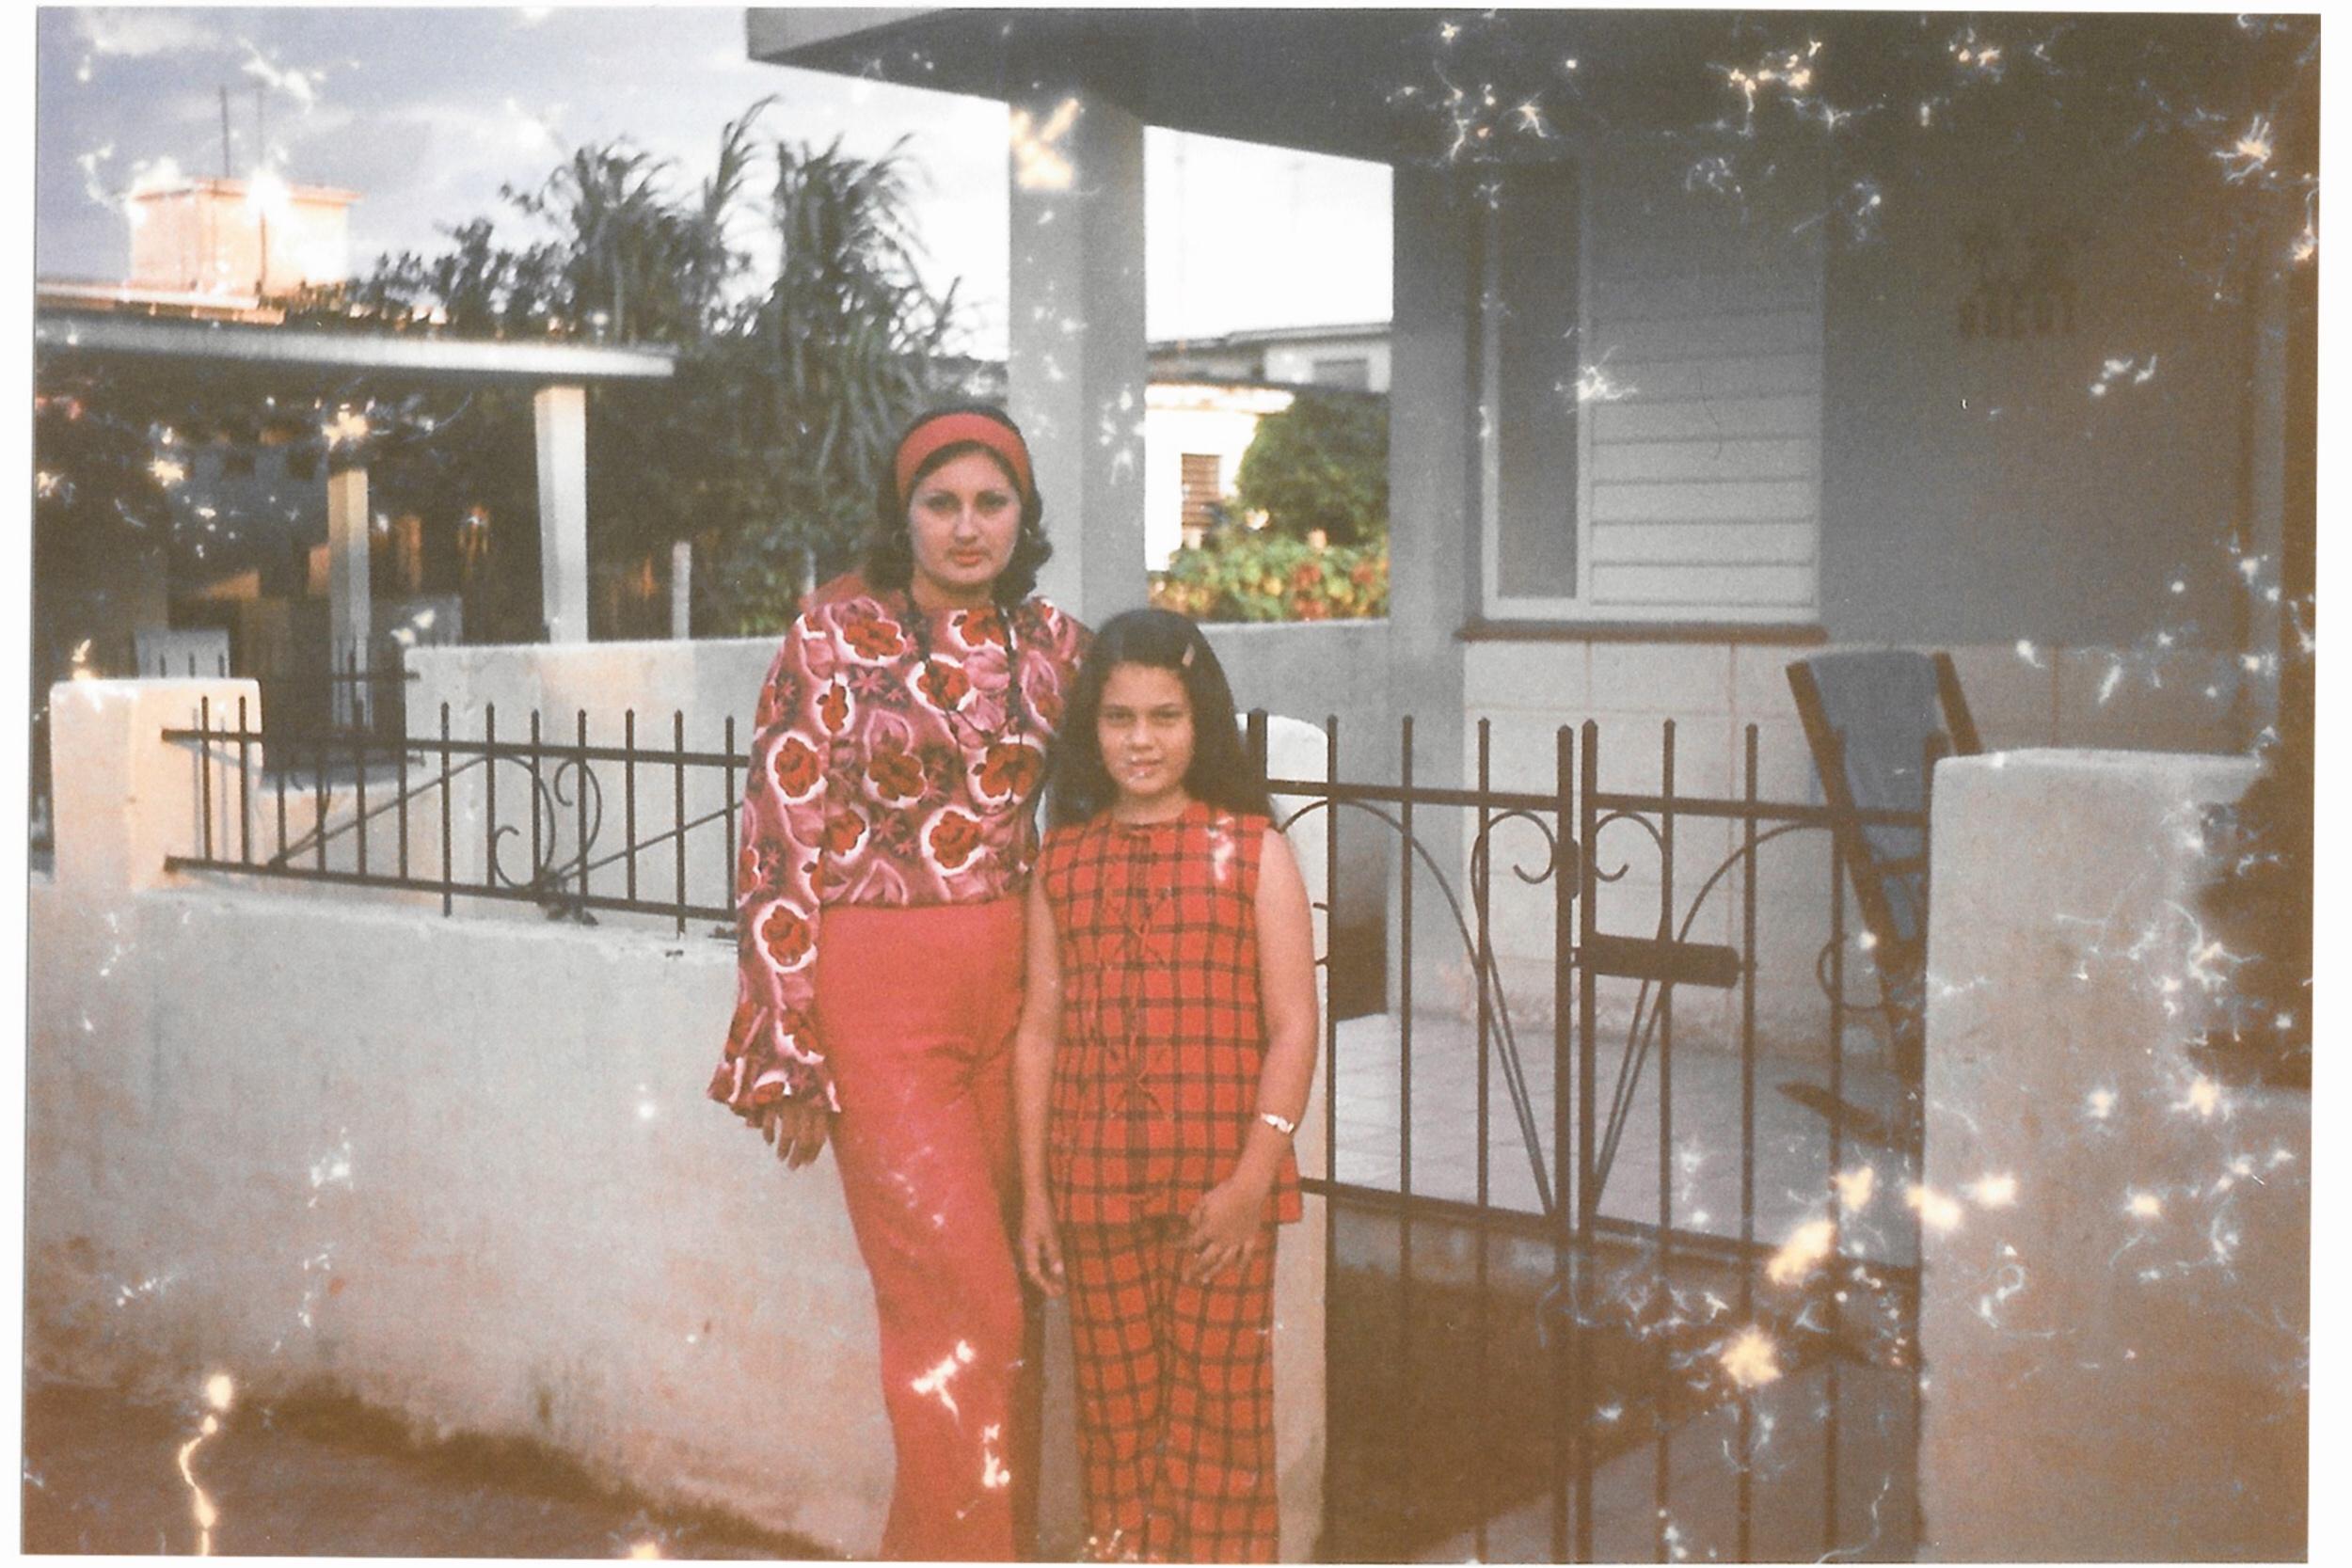 My grandmother and mother in Havana, Cuba in 1976.